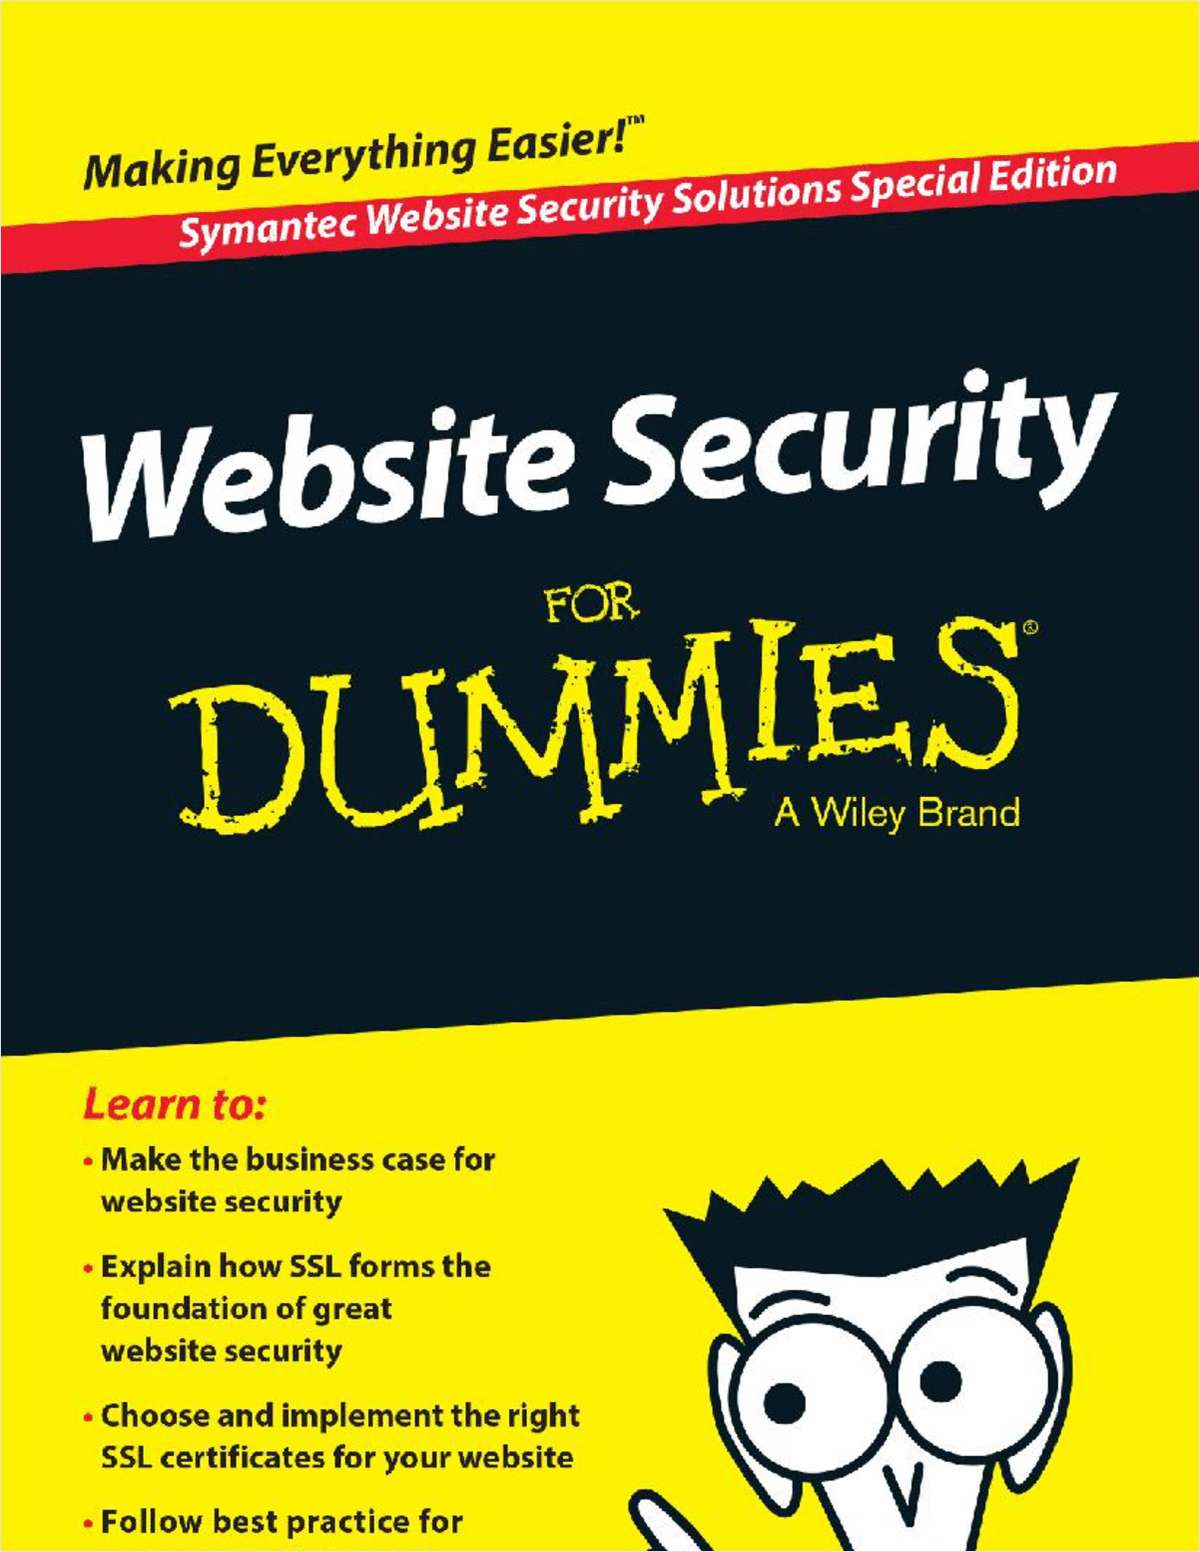 Website Security for Dummies